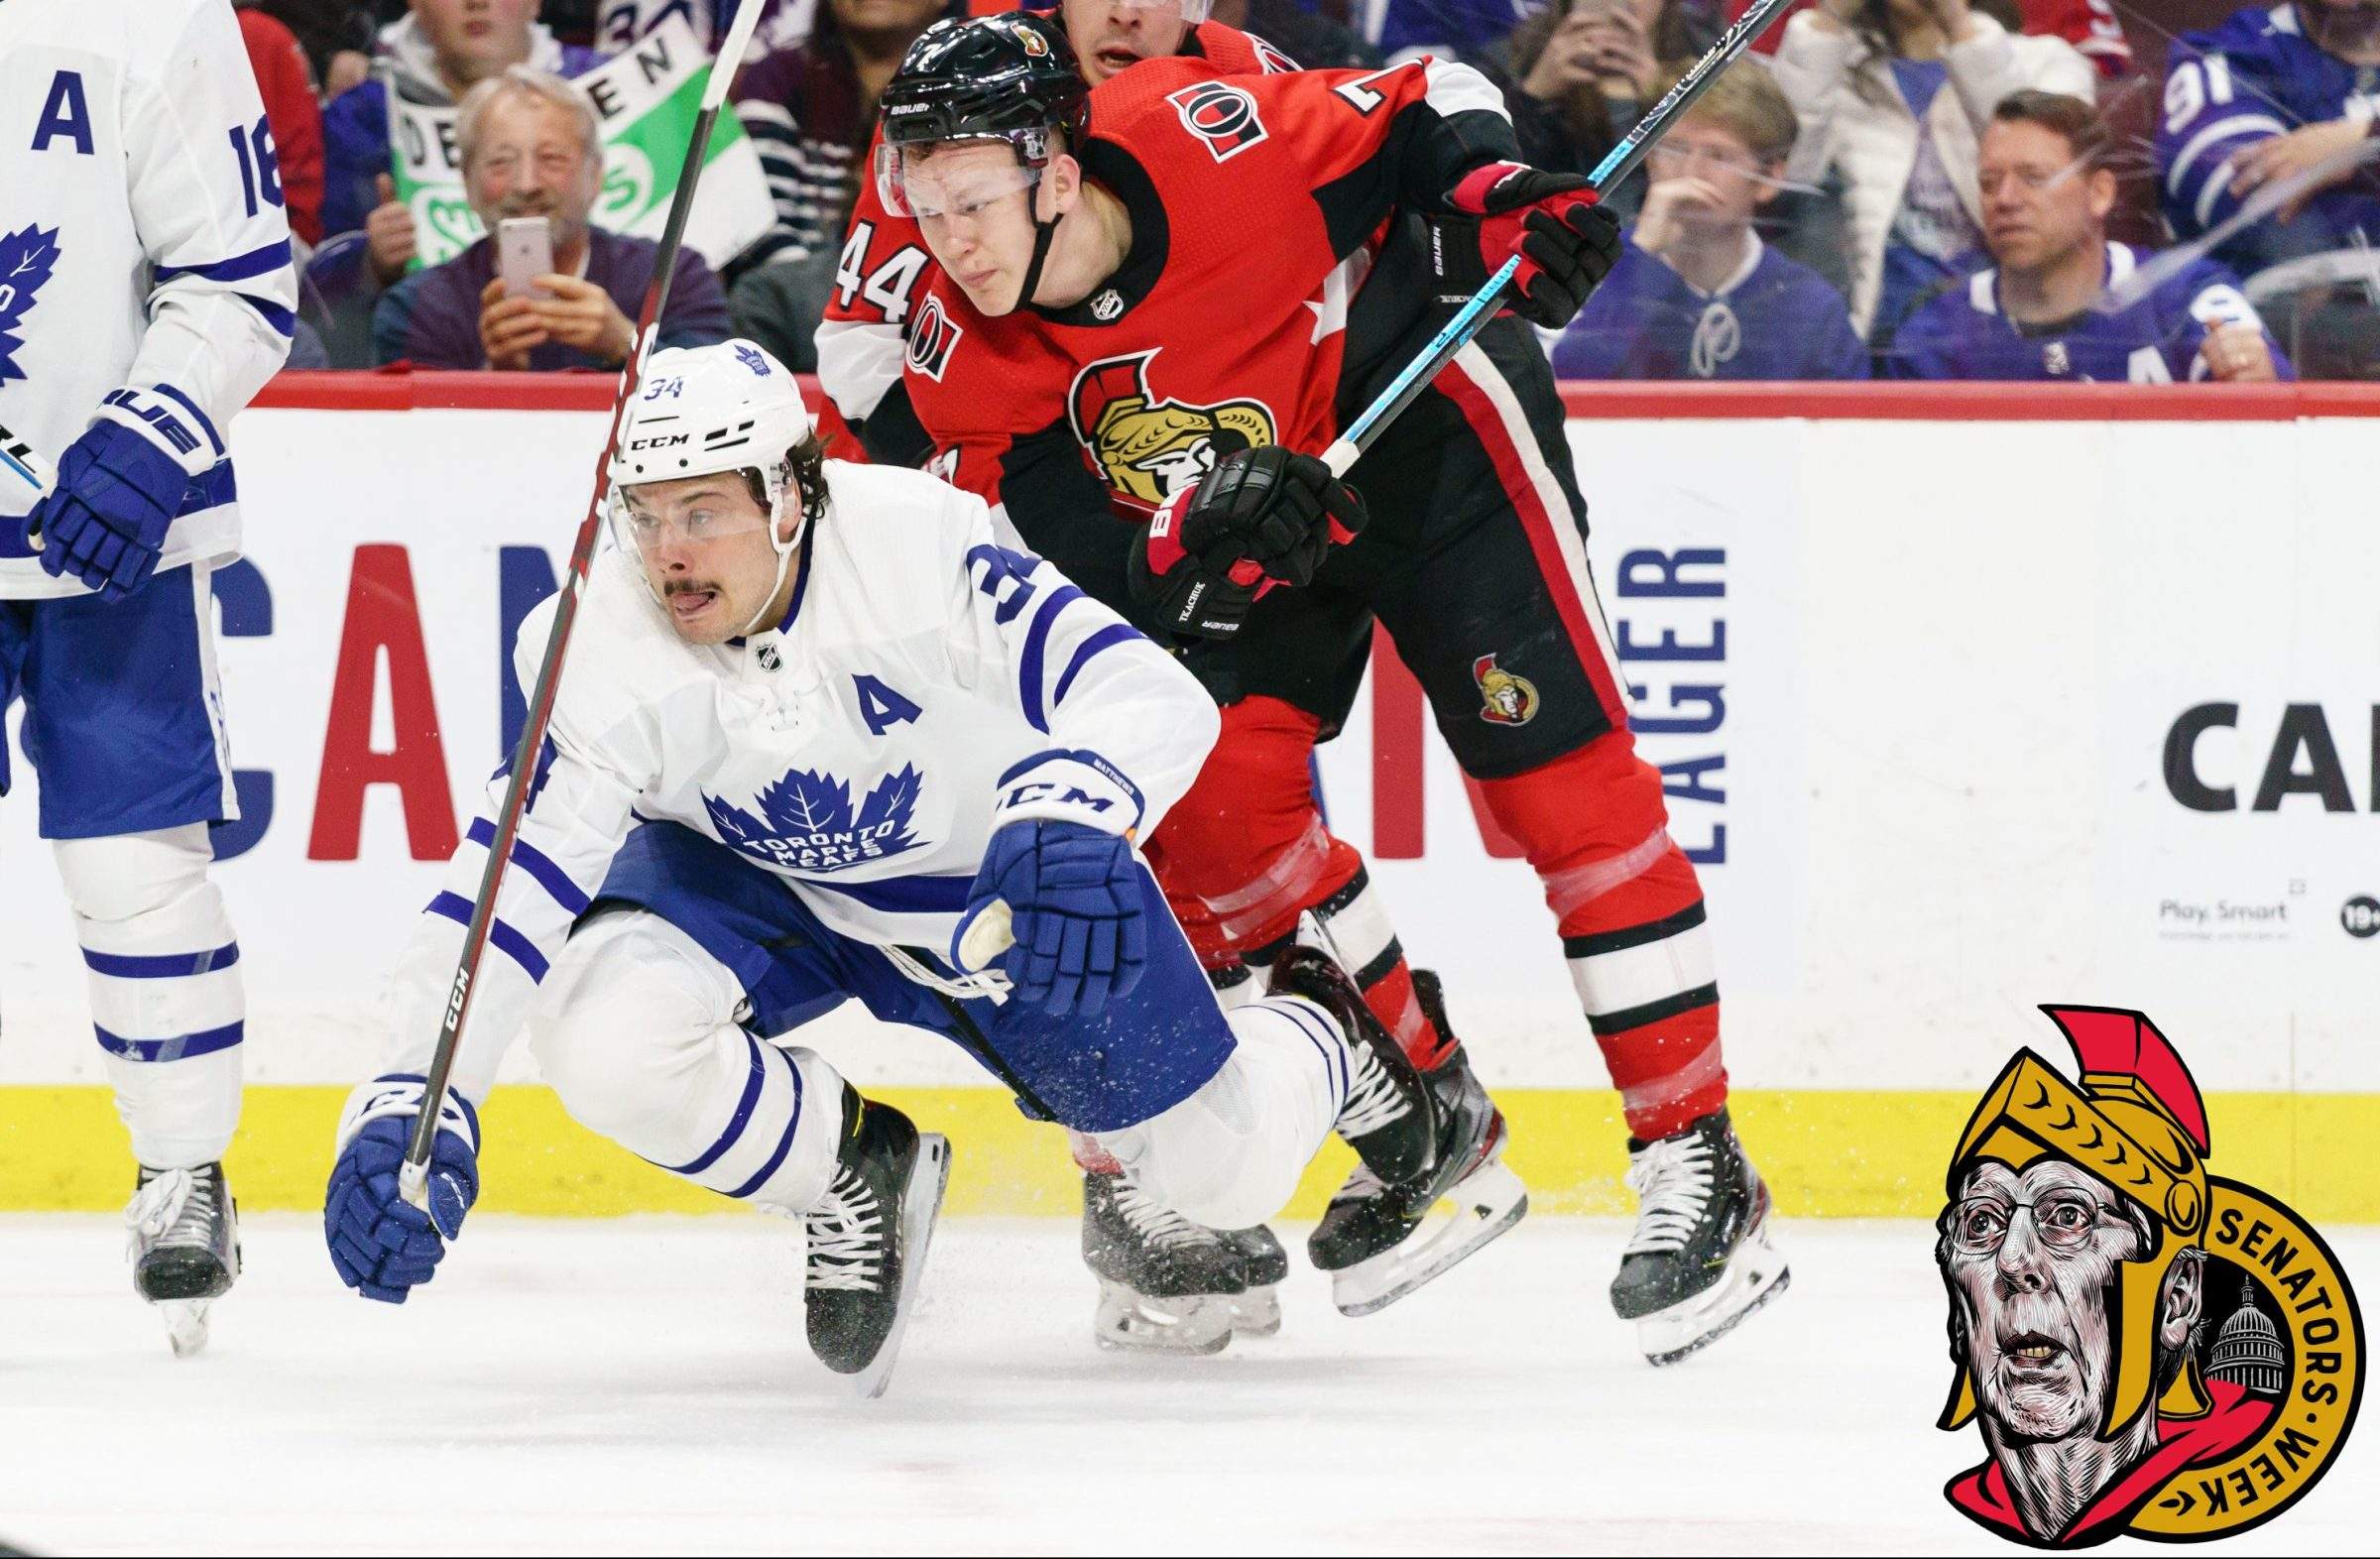 Brady Tkachuk of the Ottawa Senators checks Auston Matthews, much as he might check Ted Cruz